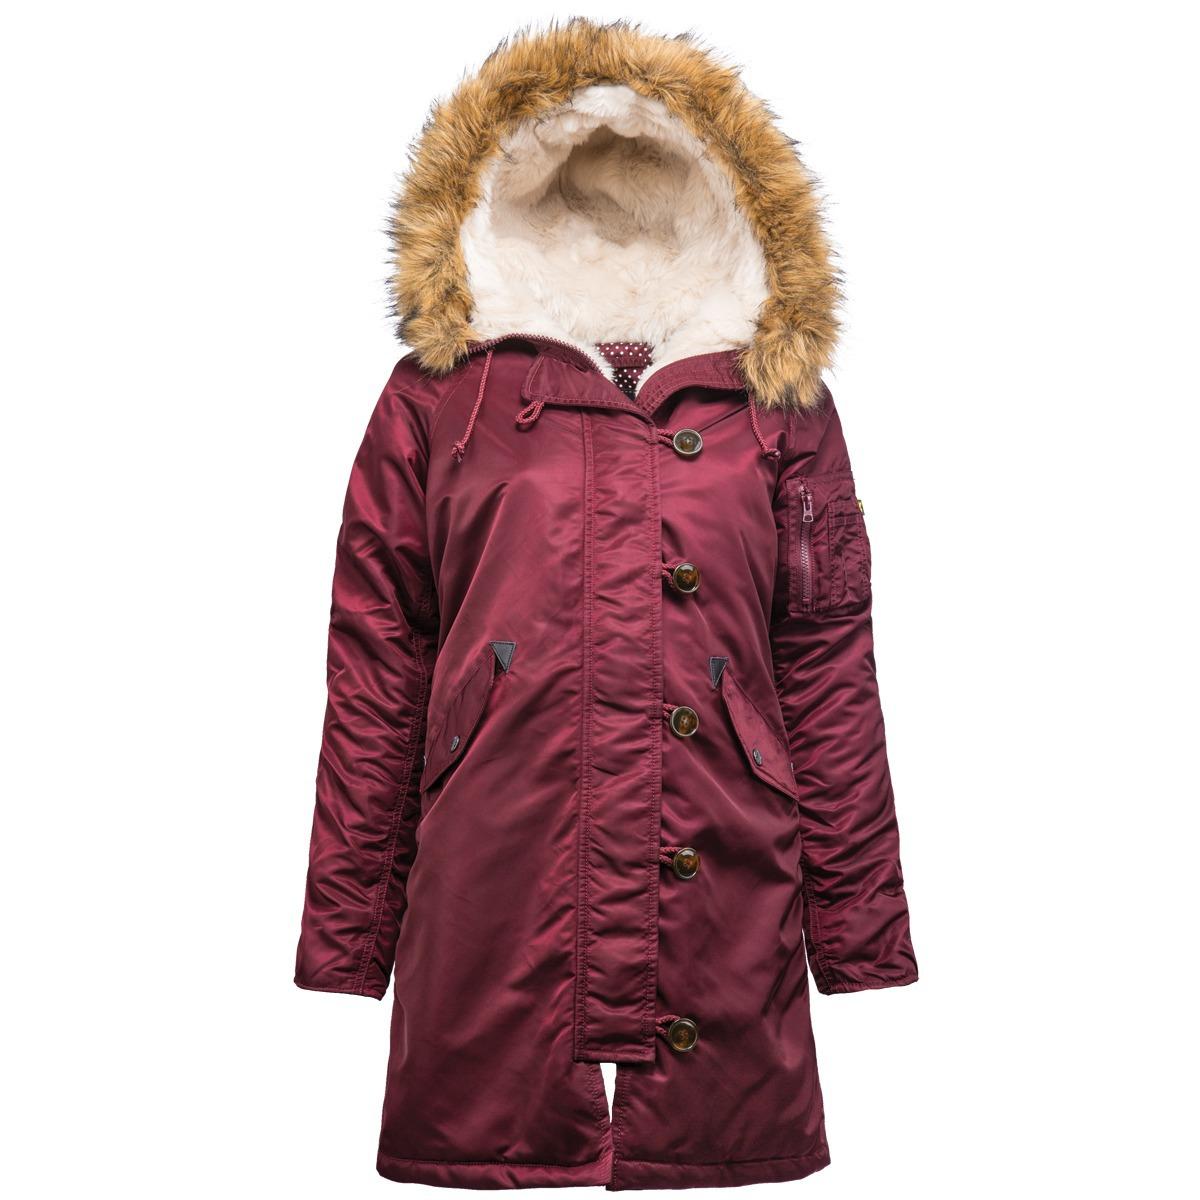 Куртка Аляска Женская - Elyse Parka 2015 (бордовая - maroon)